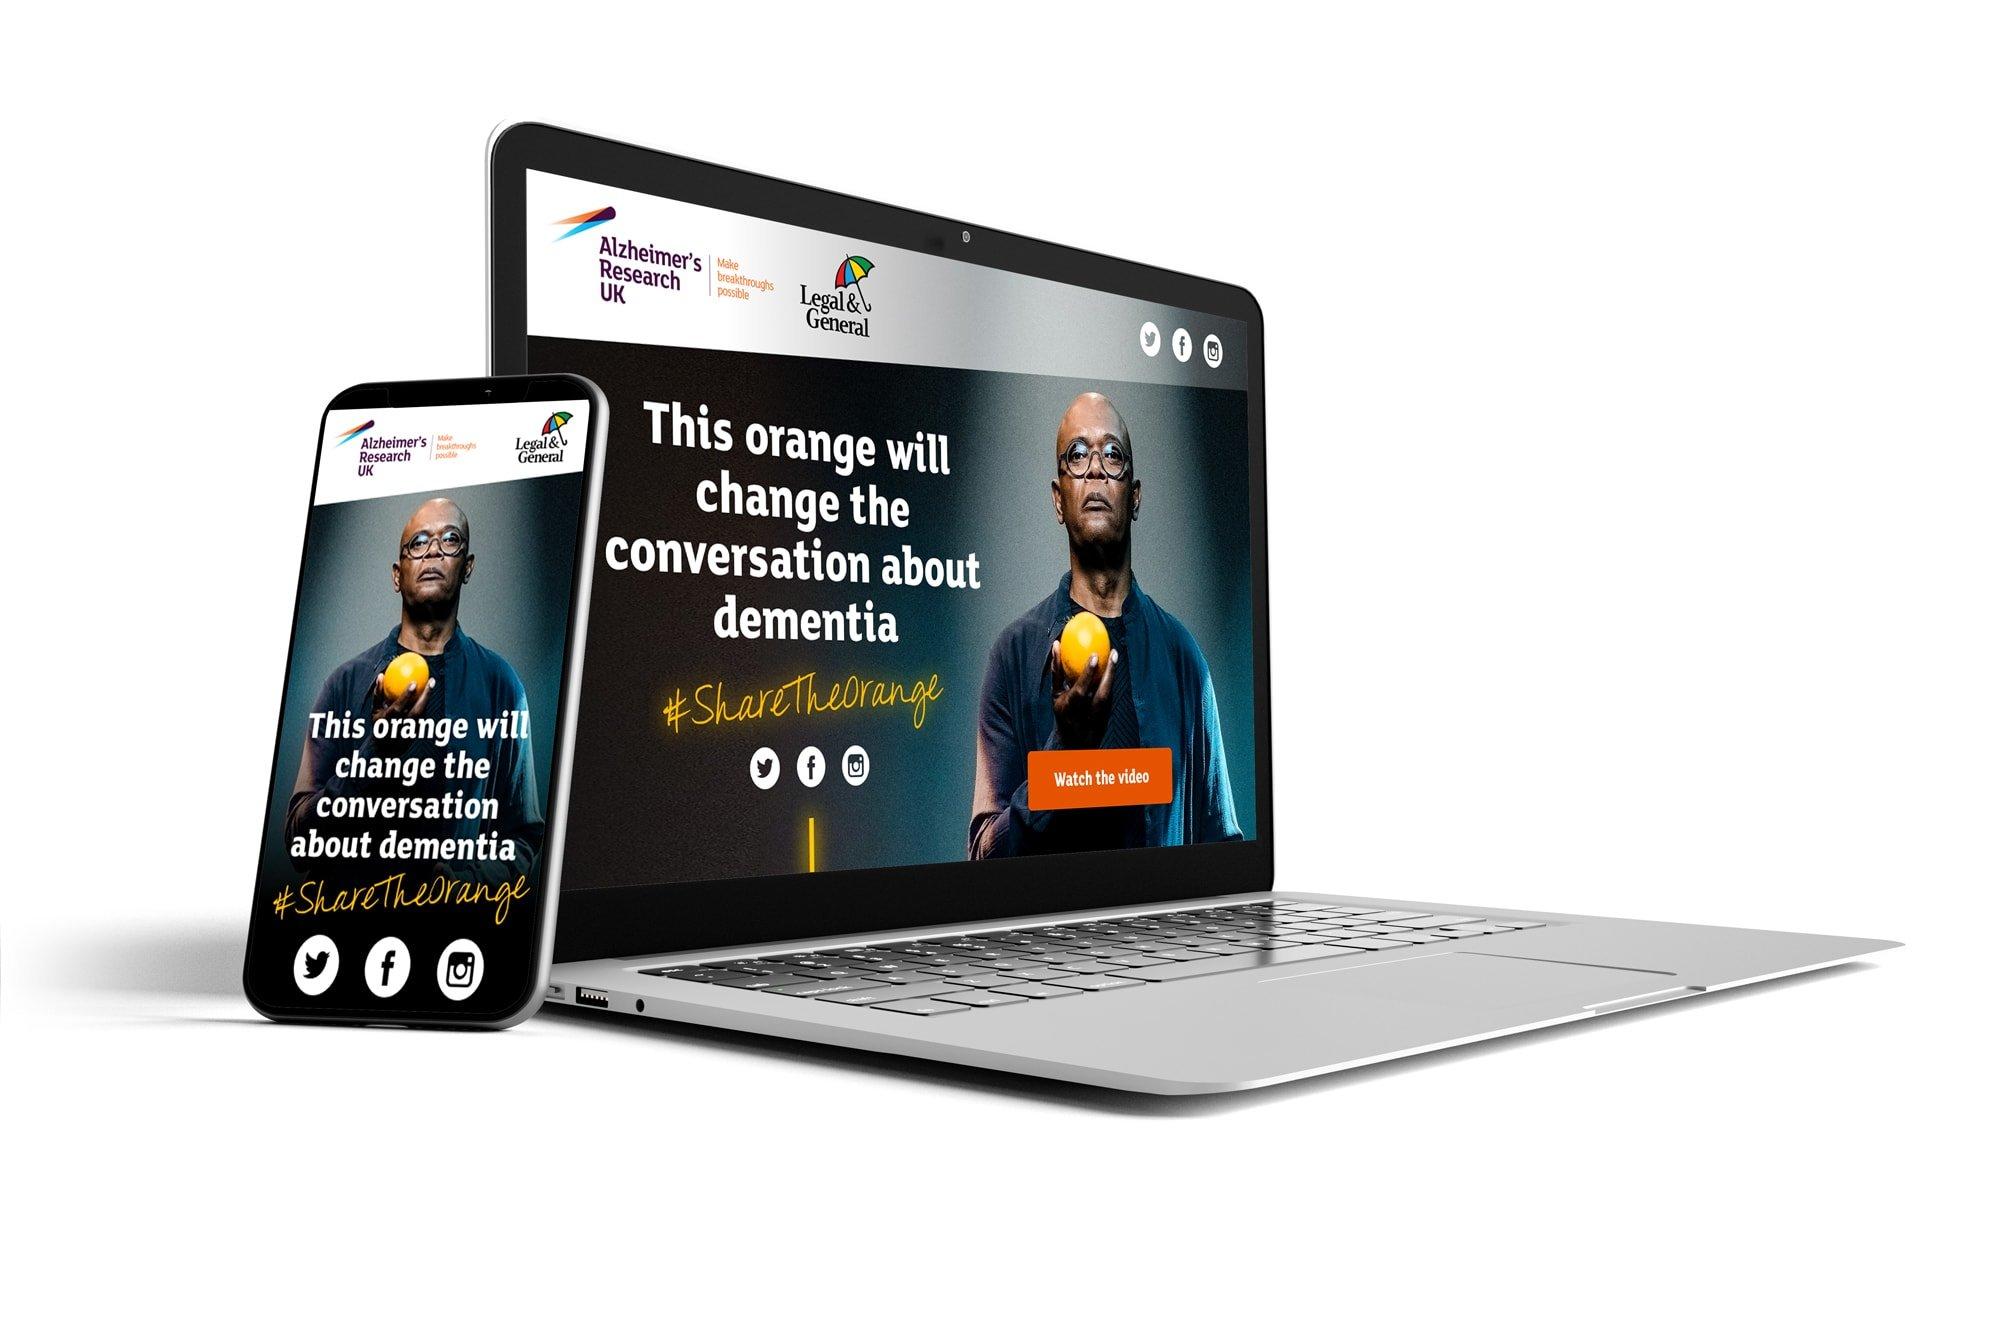 Alzheimer's Research UK - Share the Orange by BoldLight